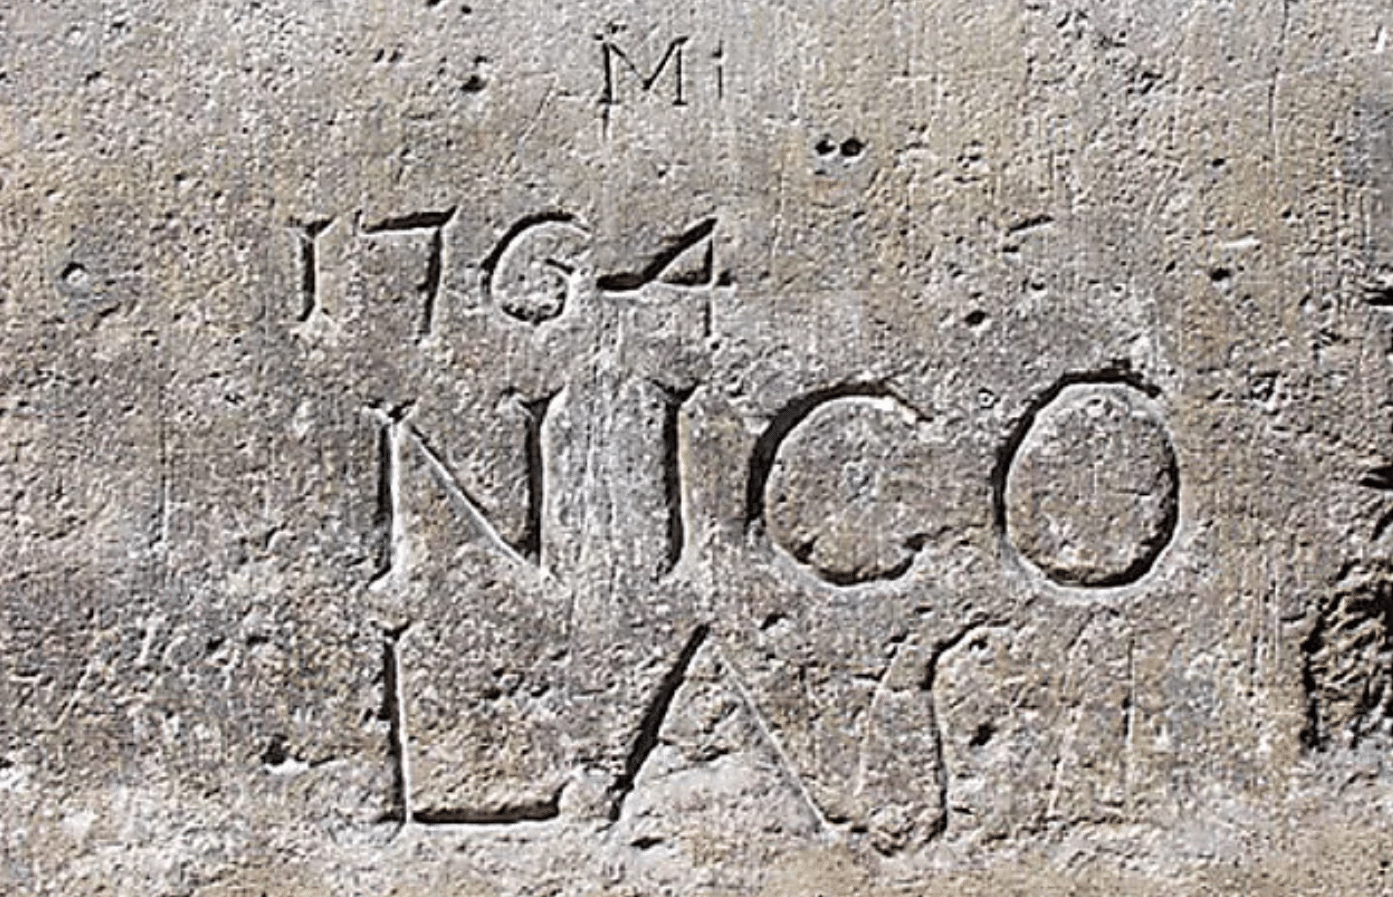 graffiti paris 1764 nicola place vendome